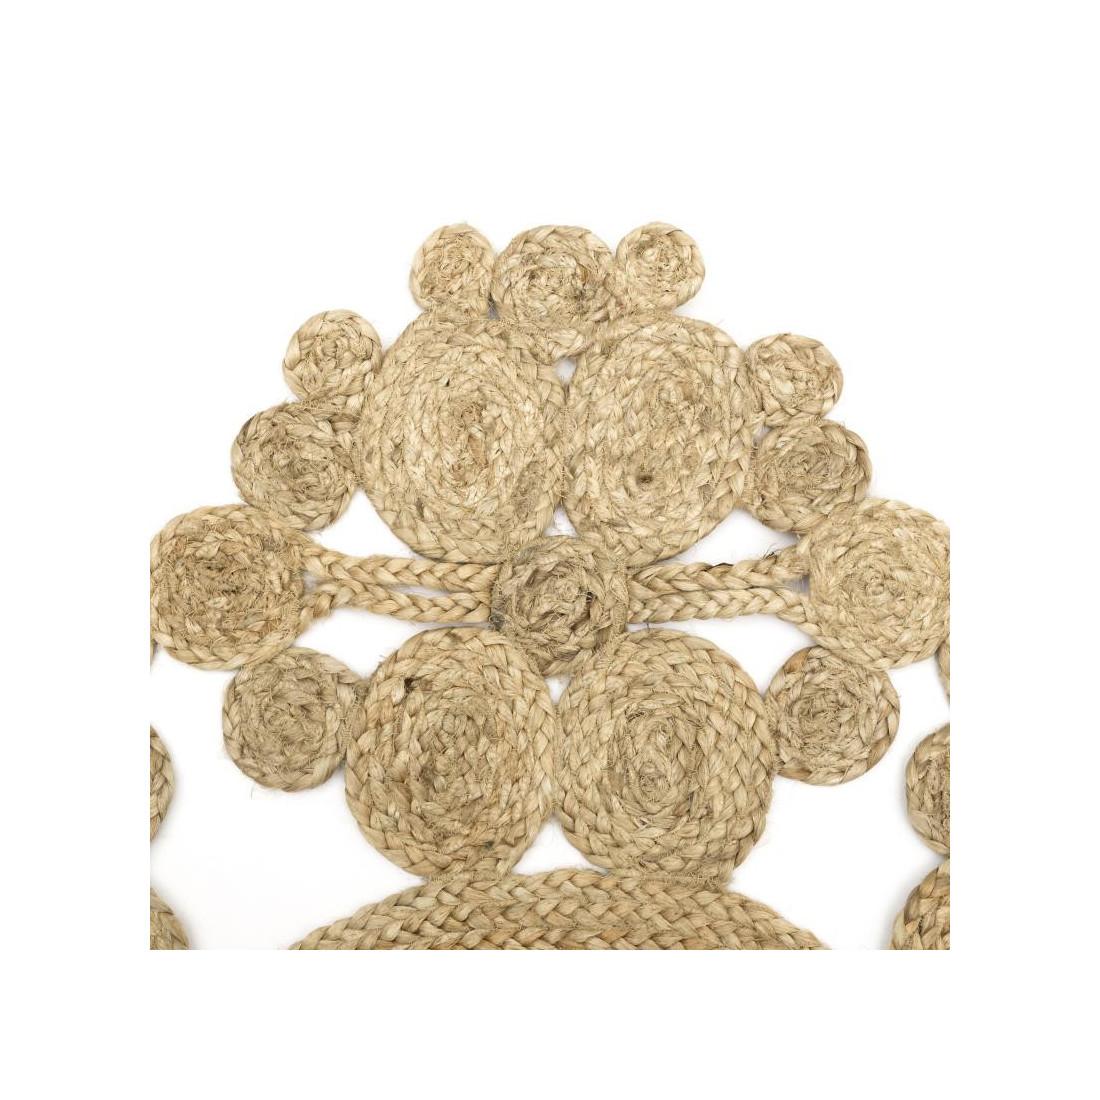 tapis fibres naturelles 120 120 n 3 peale univers de la. Black Bedroom Furniture Sets. Home Design Ideas